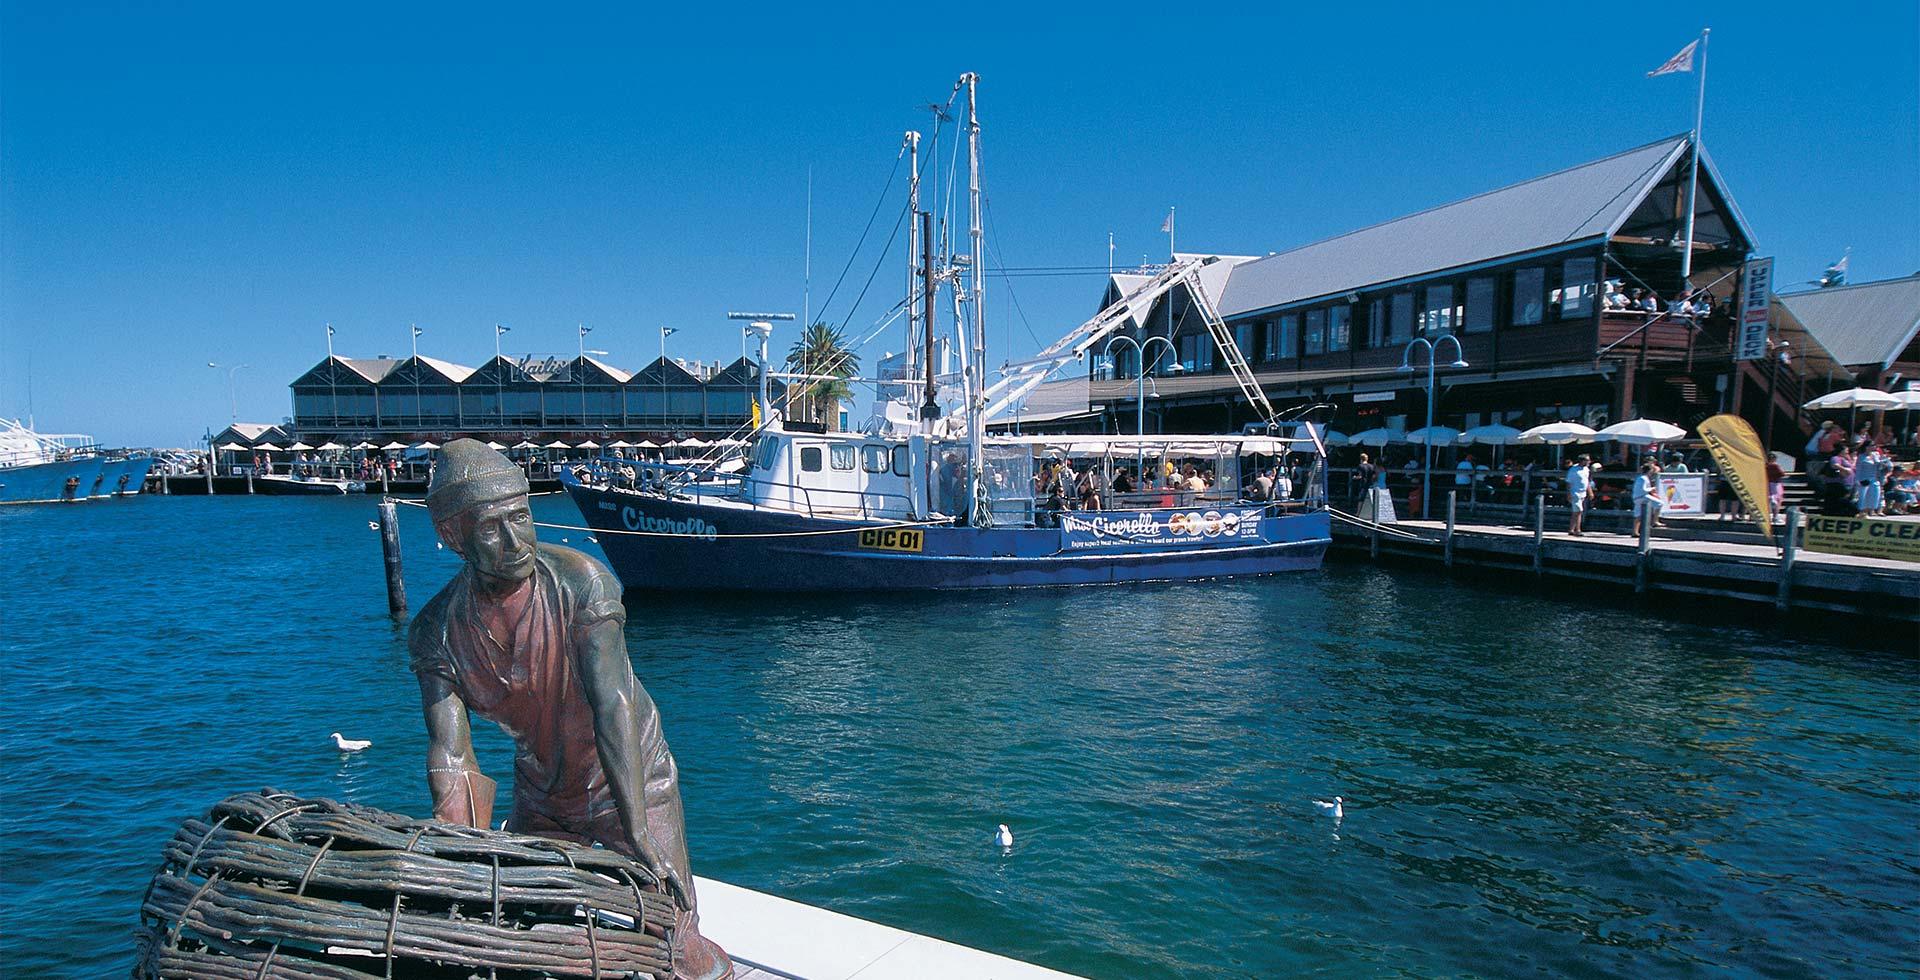 Enjoy ocean front dining in Fremantle's Fishing boat harbour